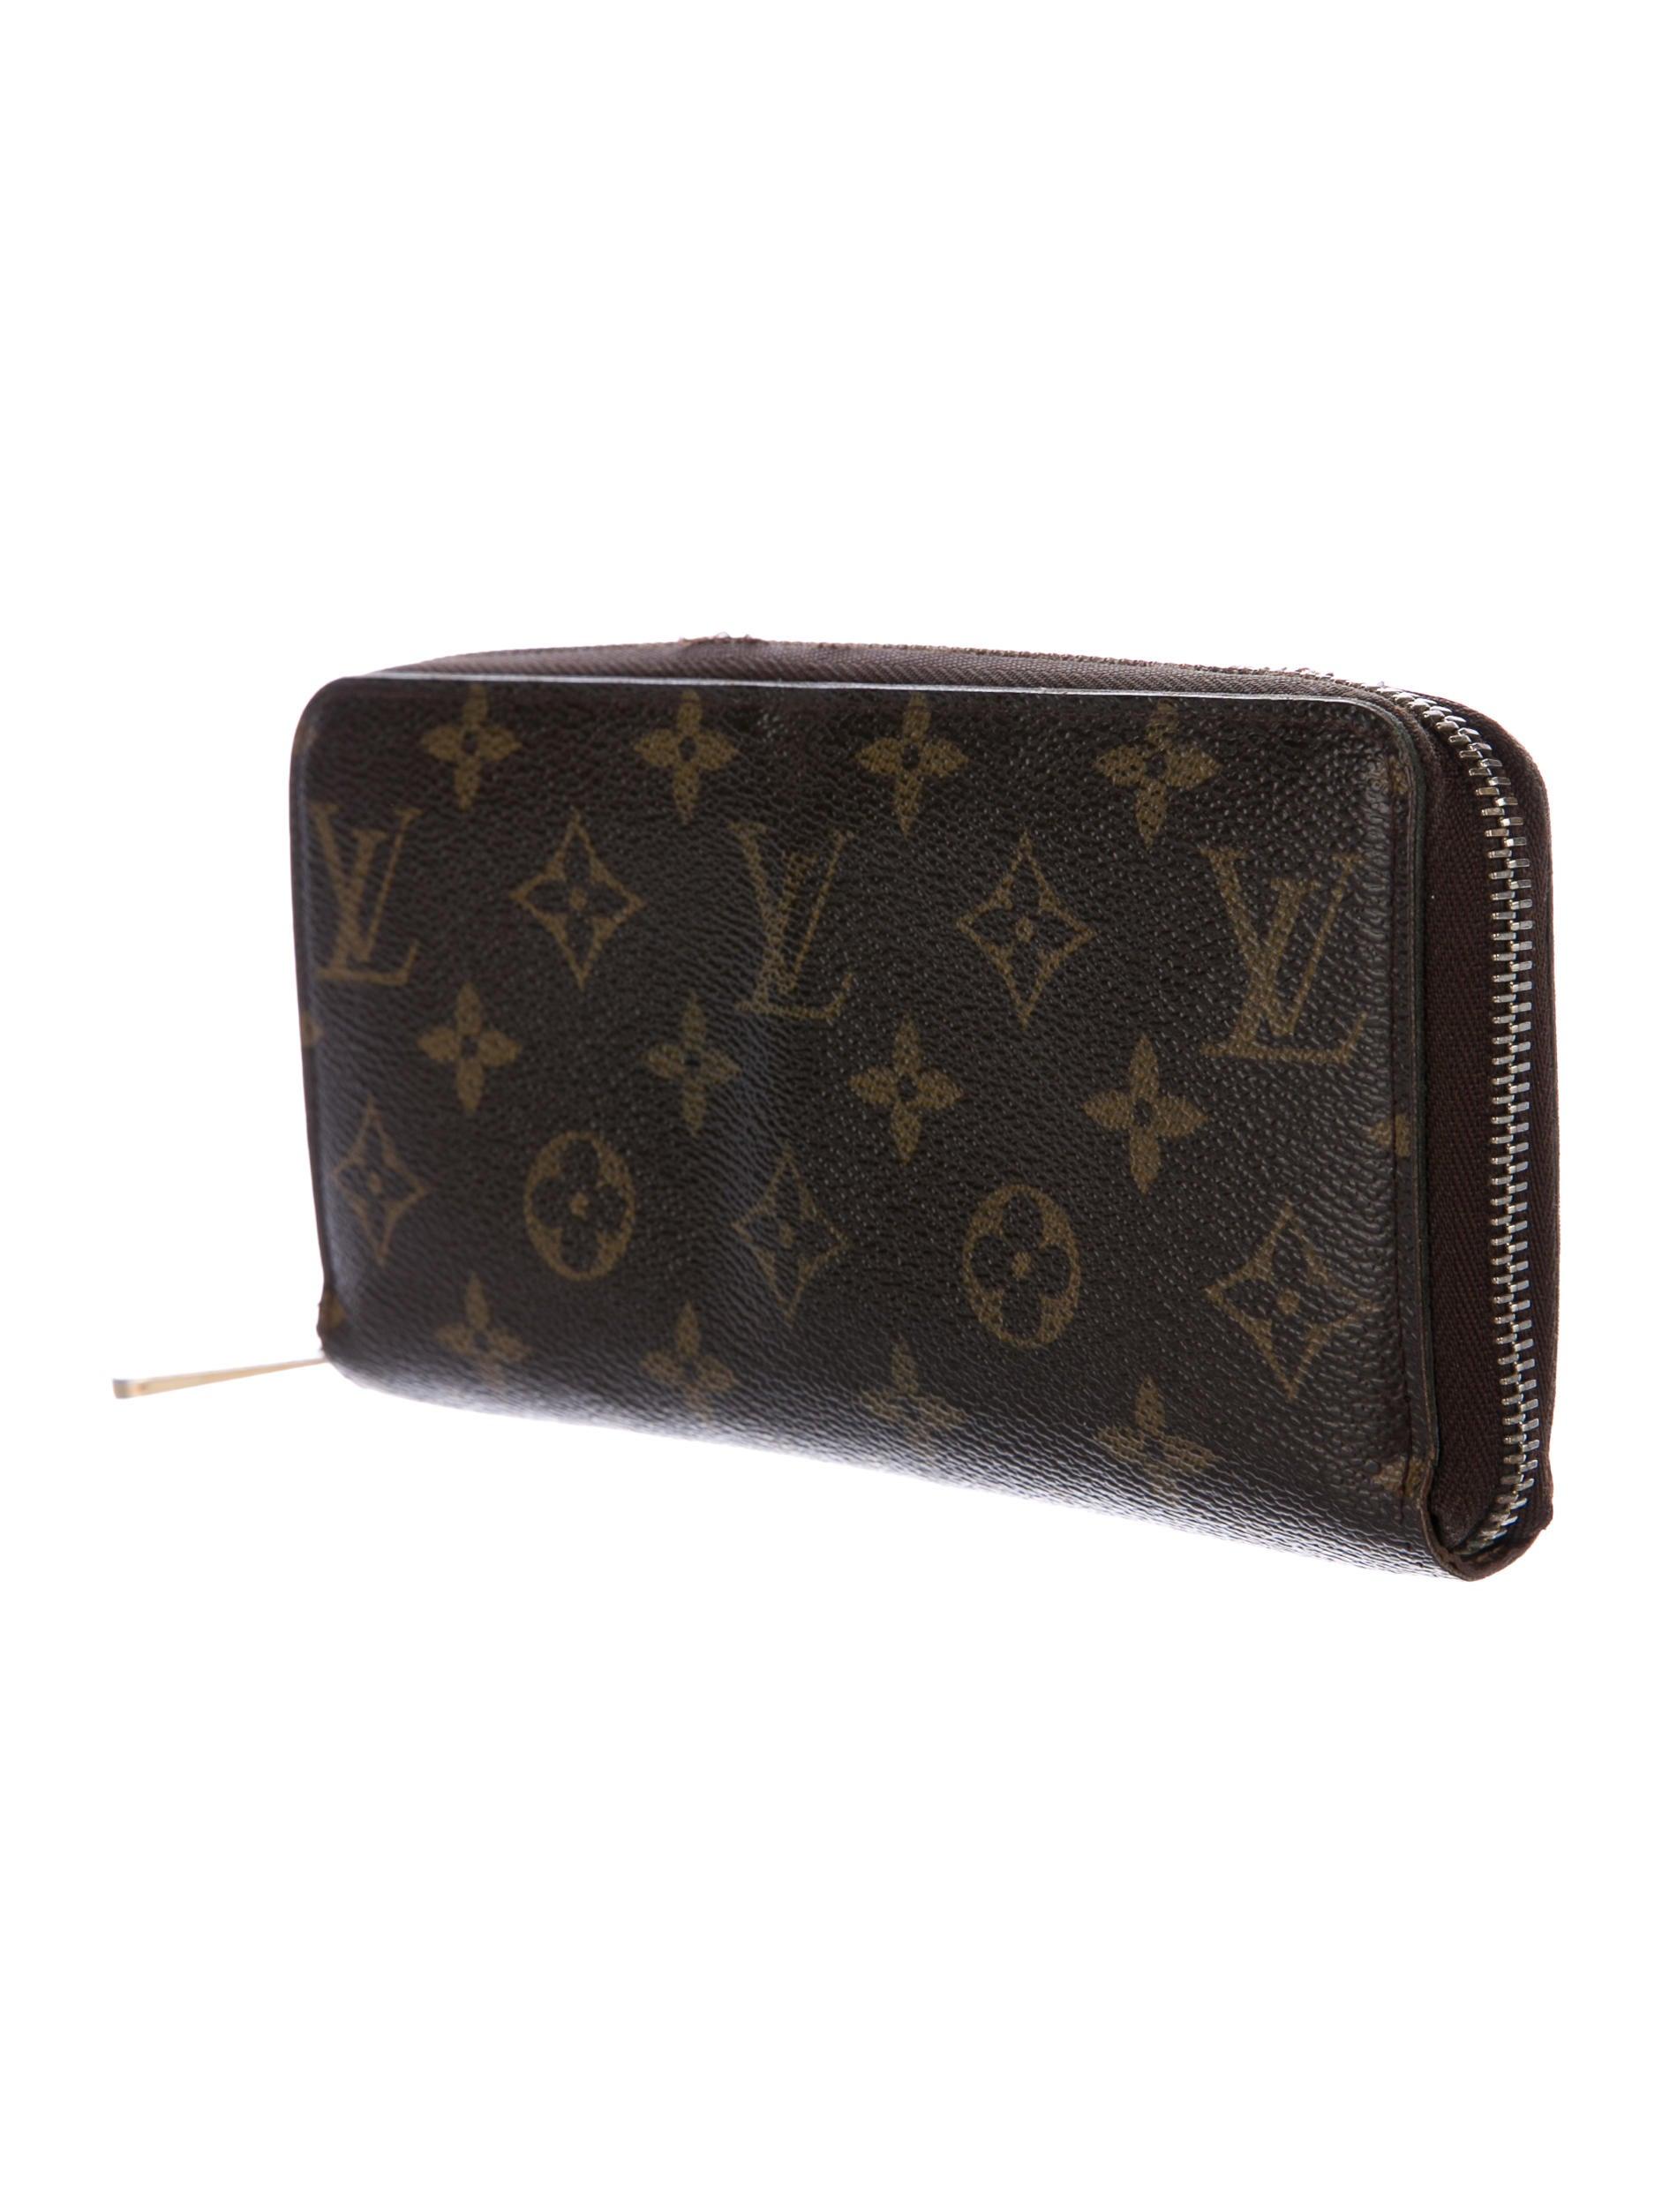 louis vuitton monogram zippy wallet accessories lou129152 the realreal. Black Bedroom Furniture Sets. Home Design Ideas